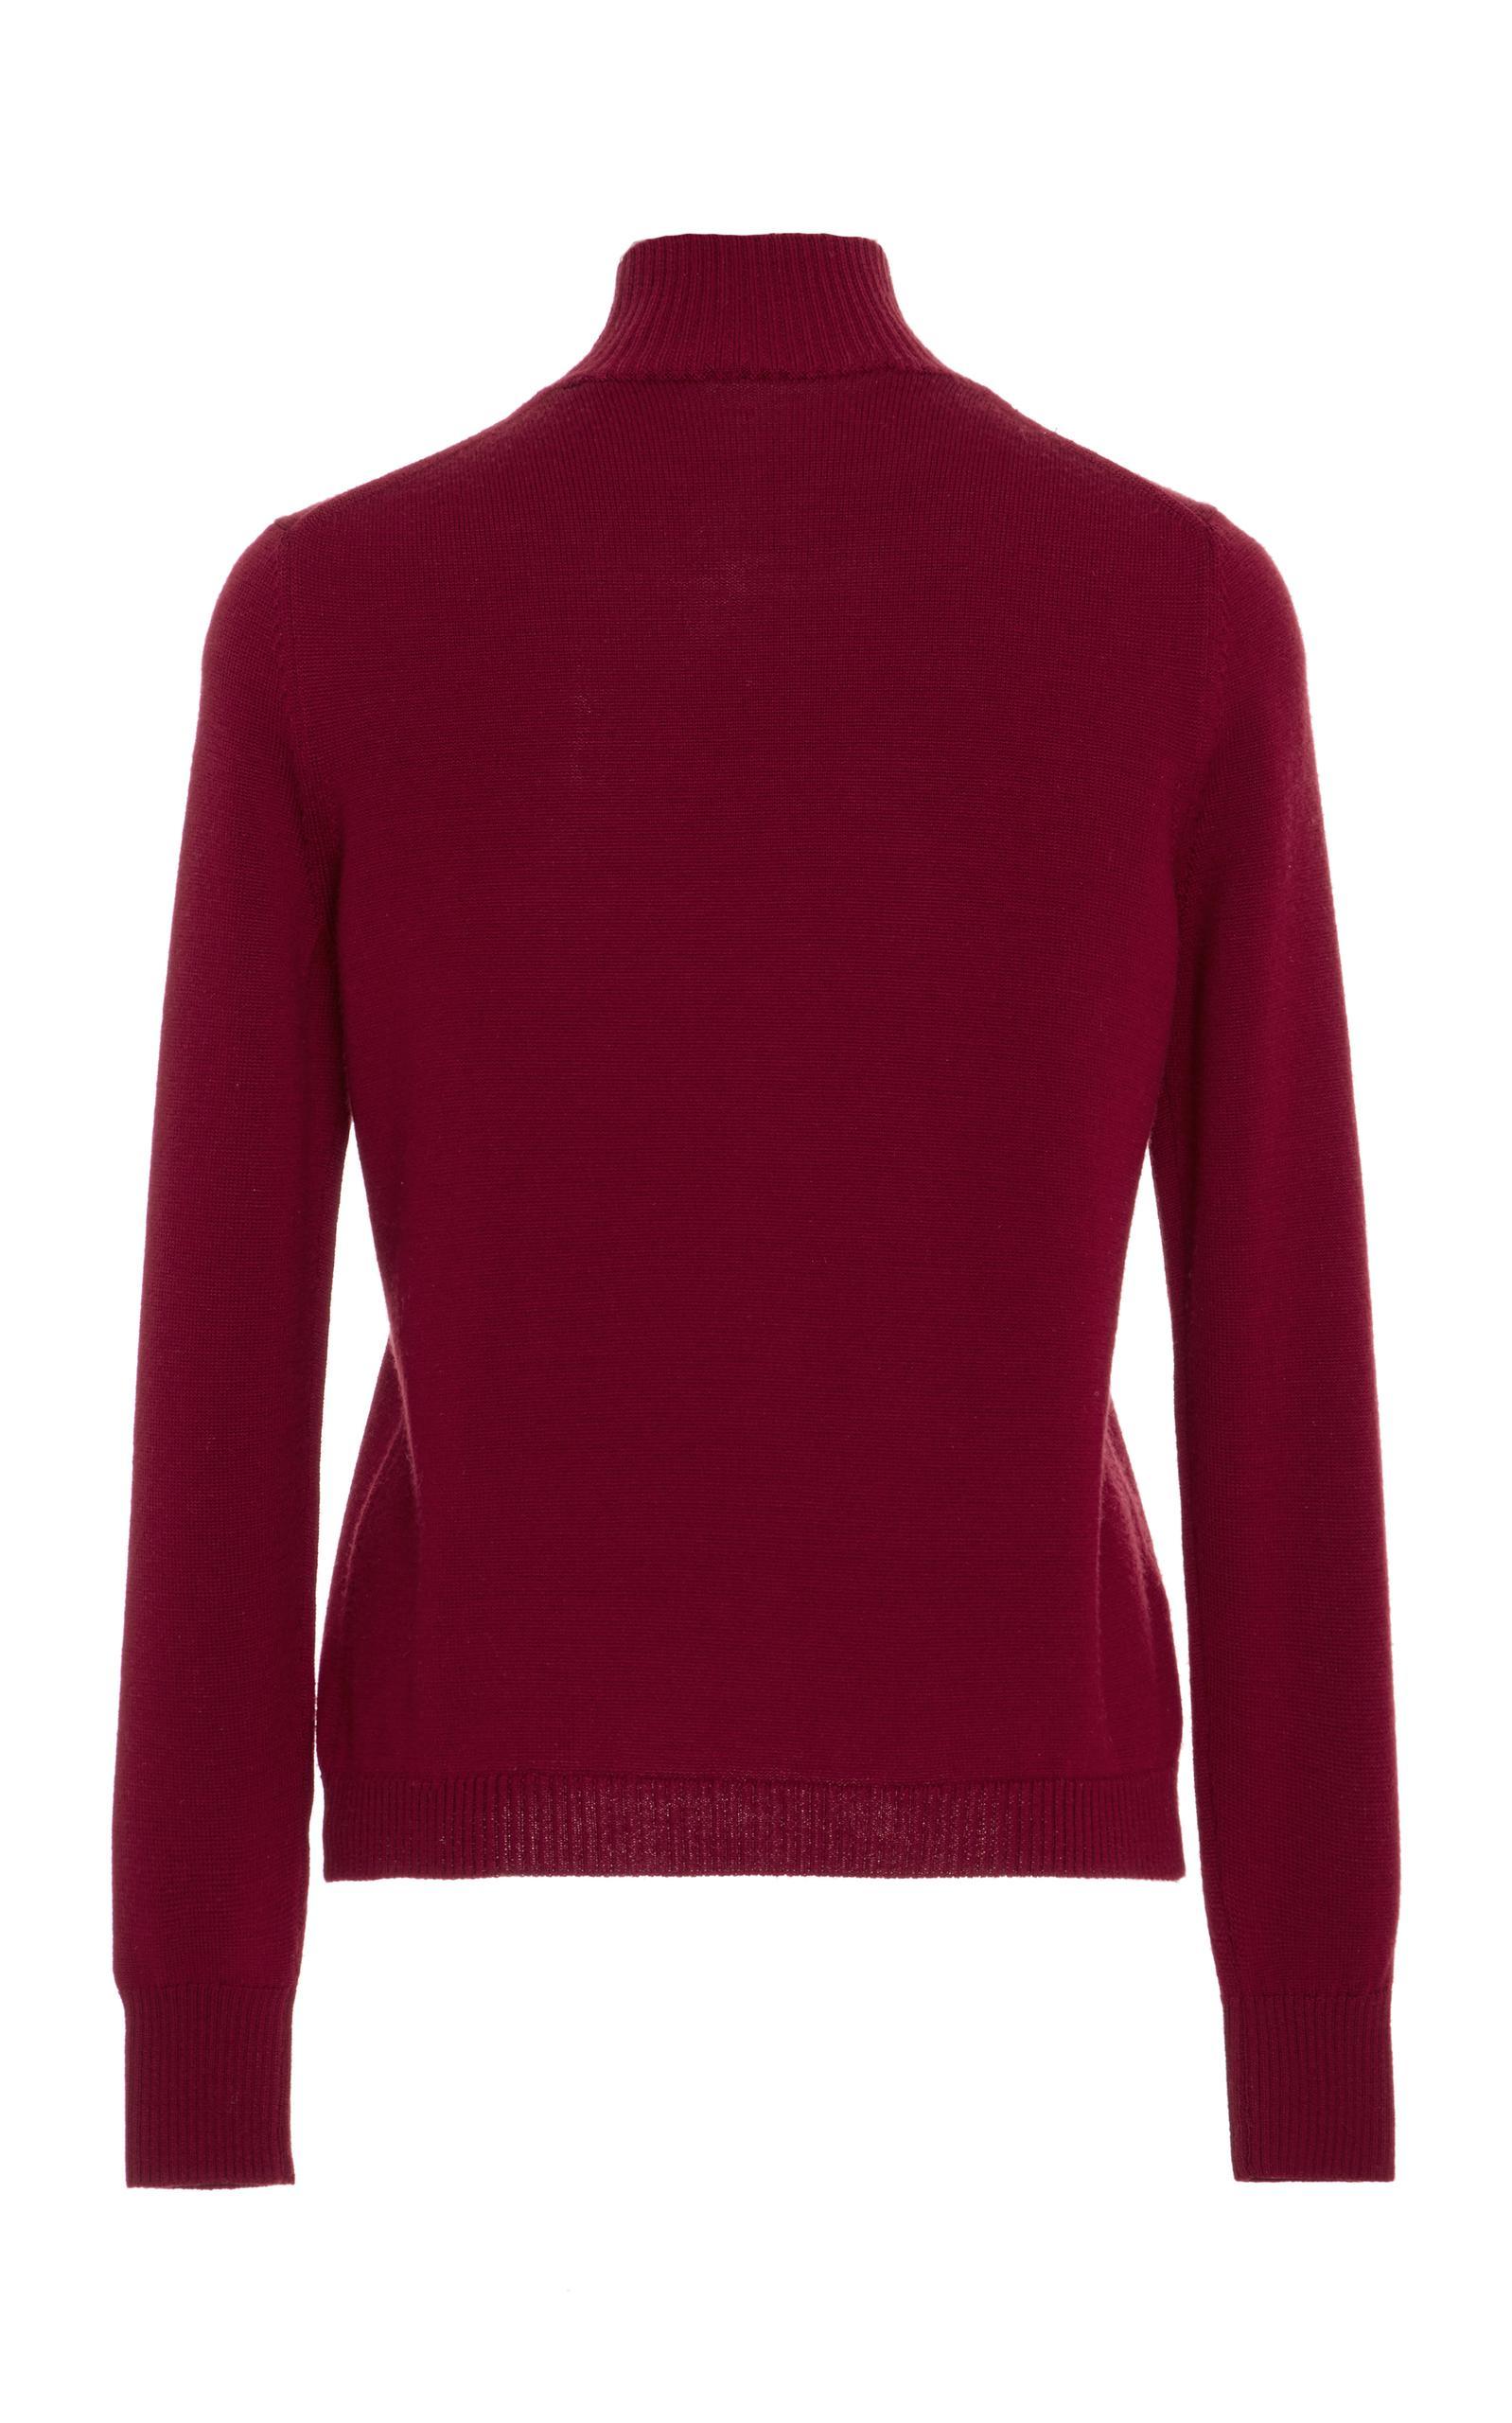 Delpozo Embellished Merino Wool Sweater in Red | Lyst